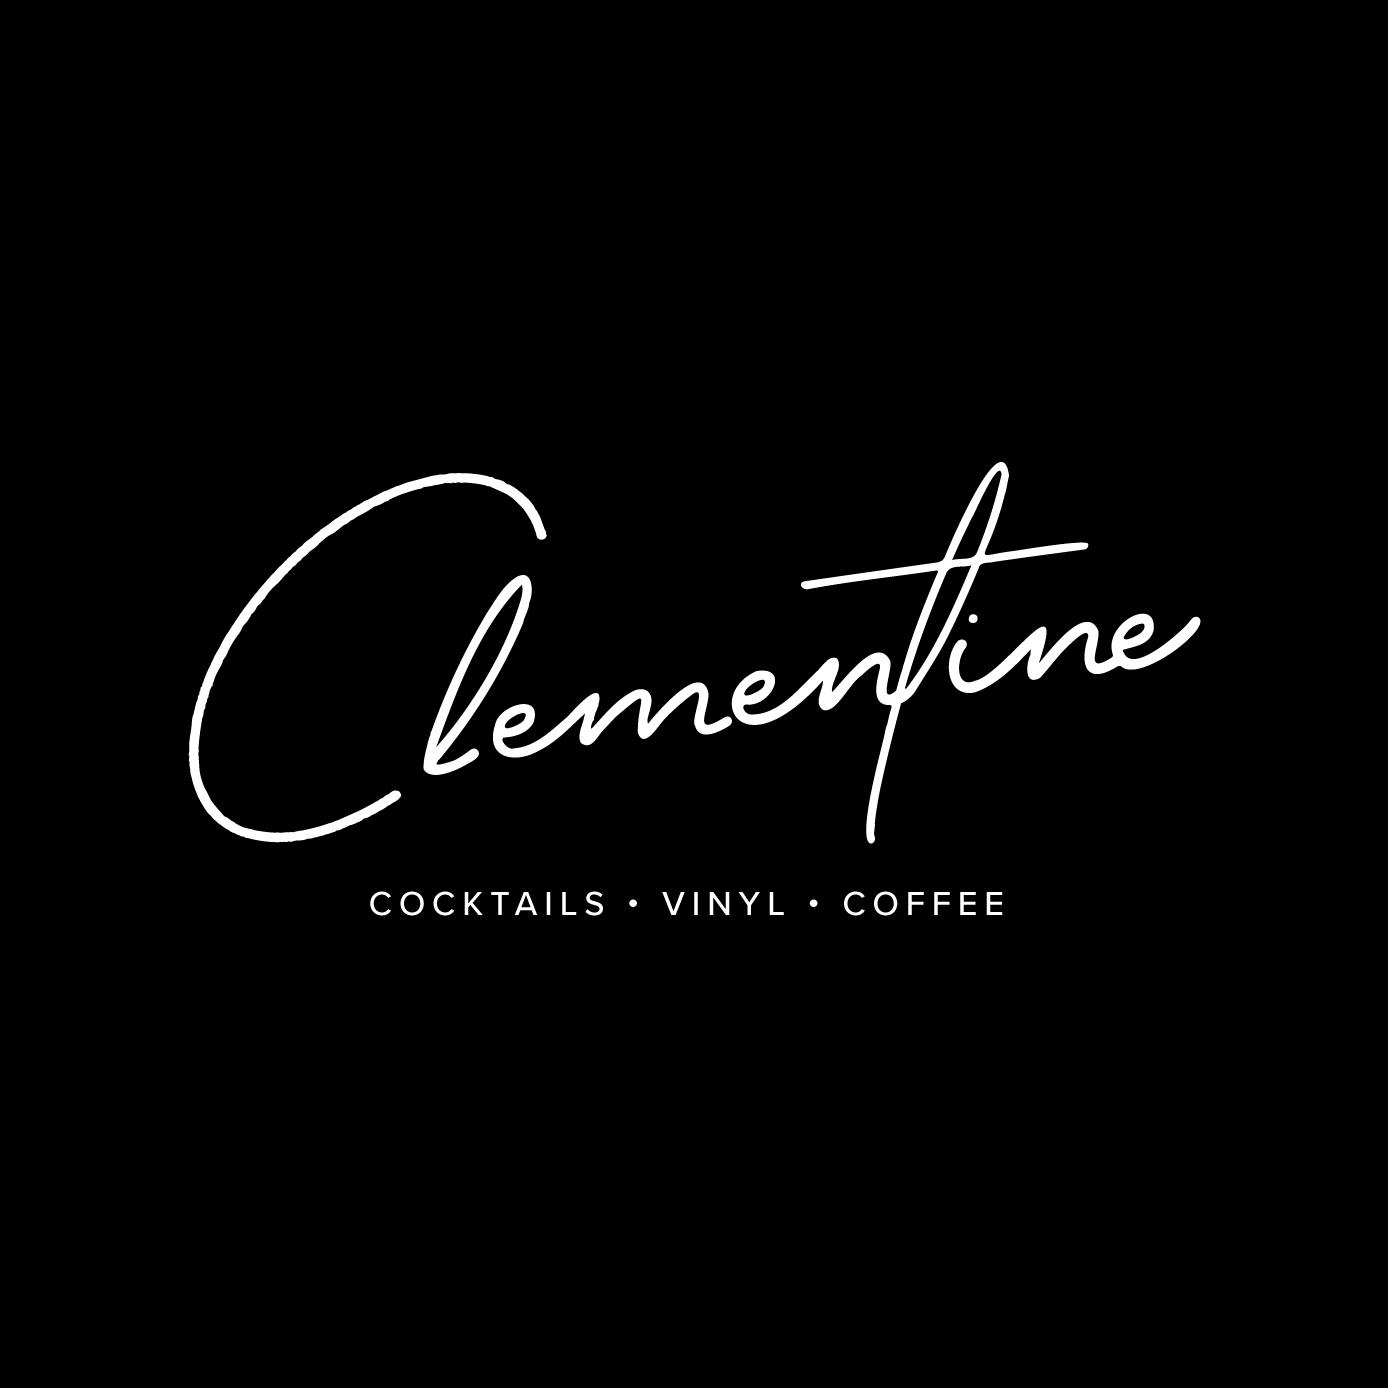 Clementine Script Logo with Black background